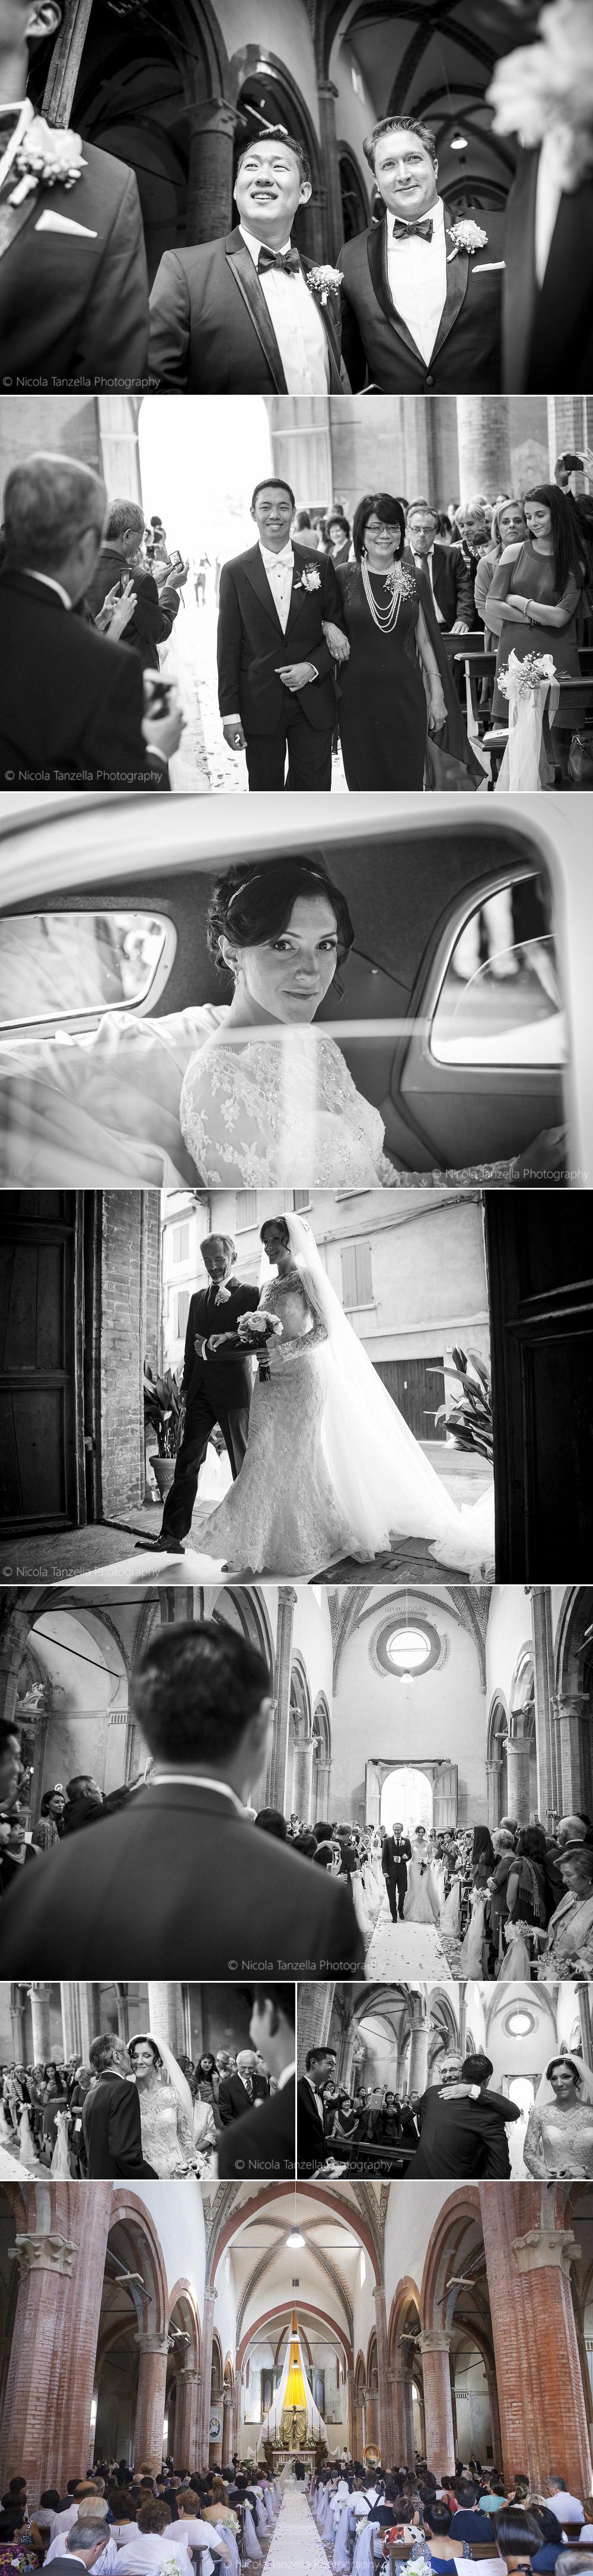 fotografo matrimonio modena -004